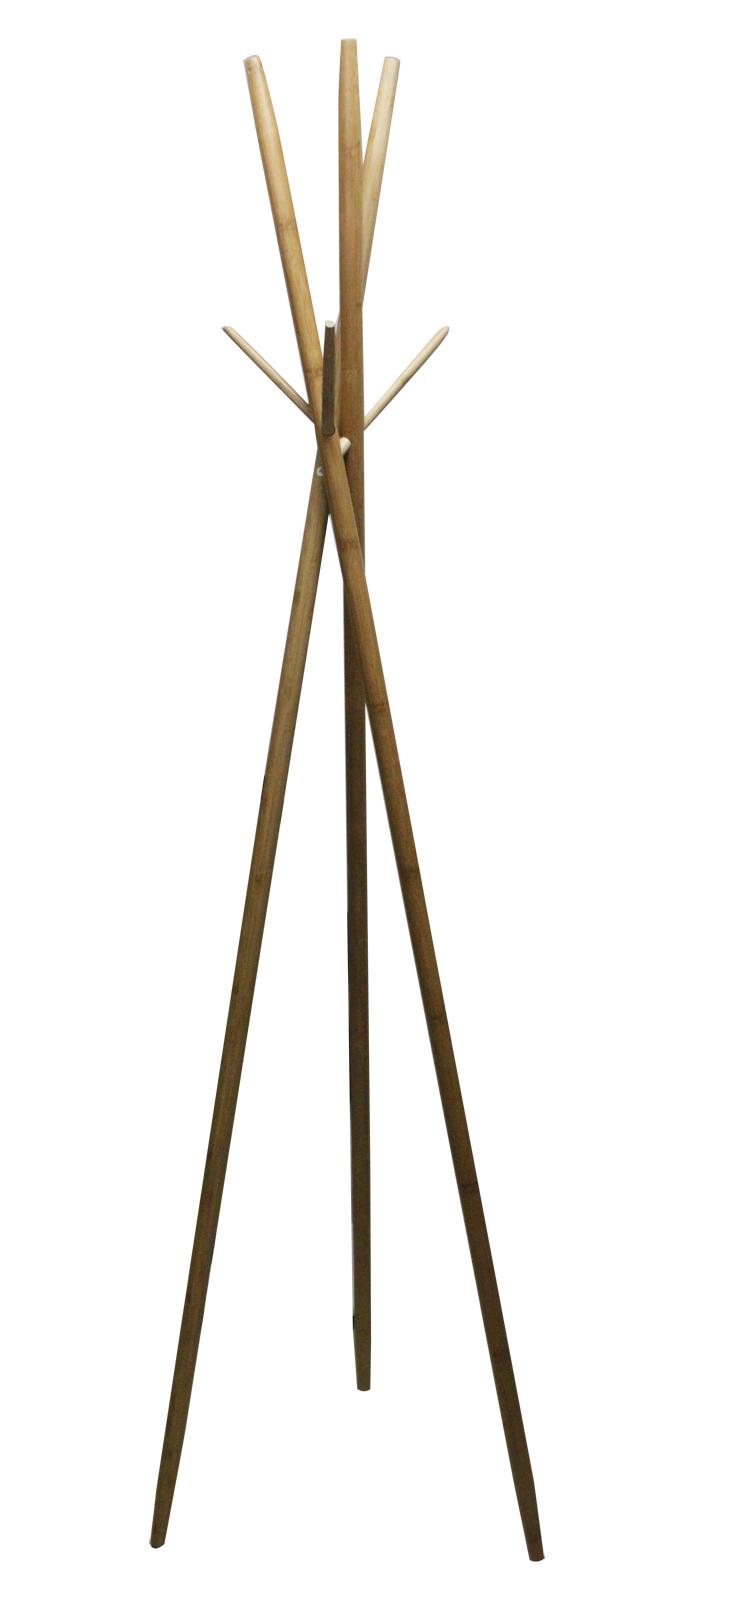 bambus garderobenst nder kleiderst nder standgarderobe holz garderobe 175cm ebay. Black Bedroom Furniture Sets. Home Design Ideas